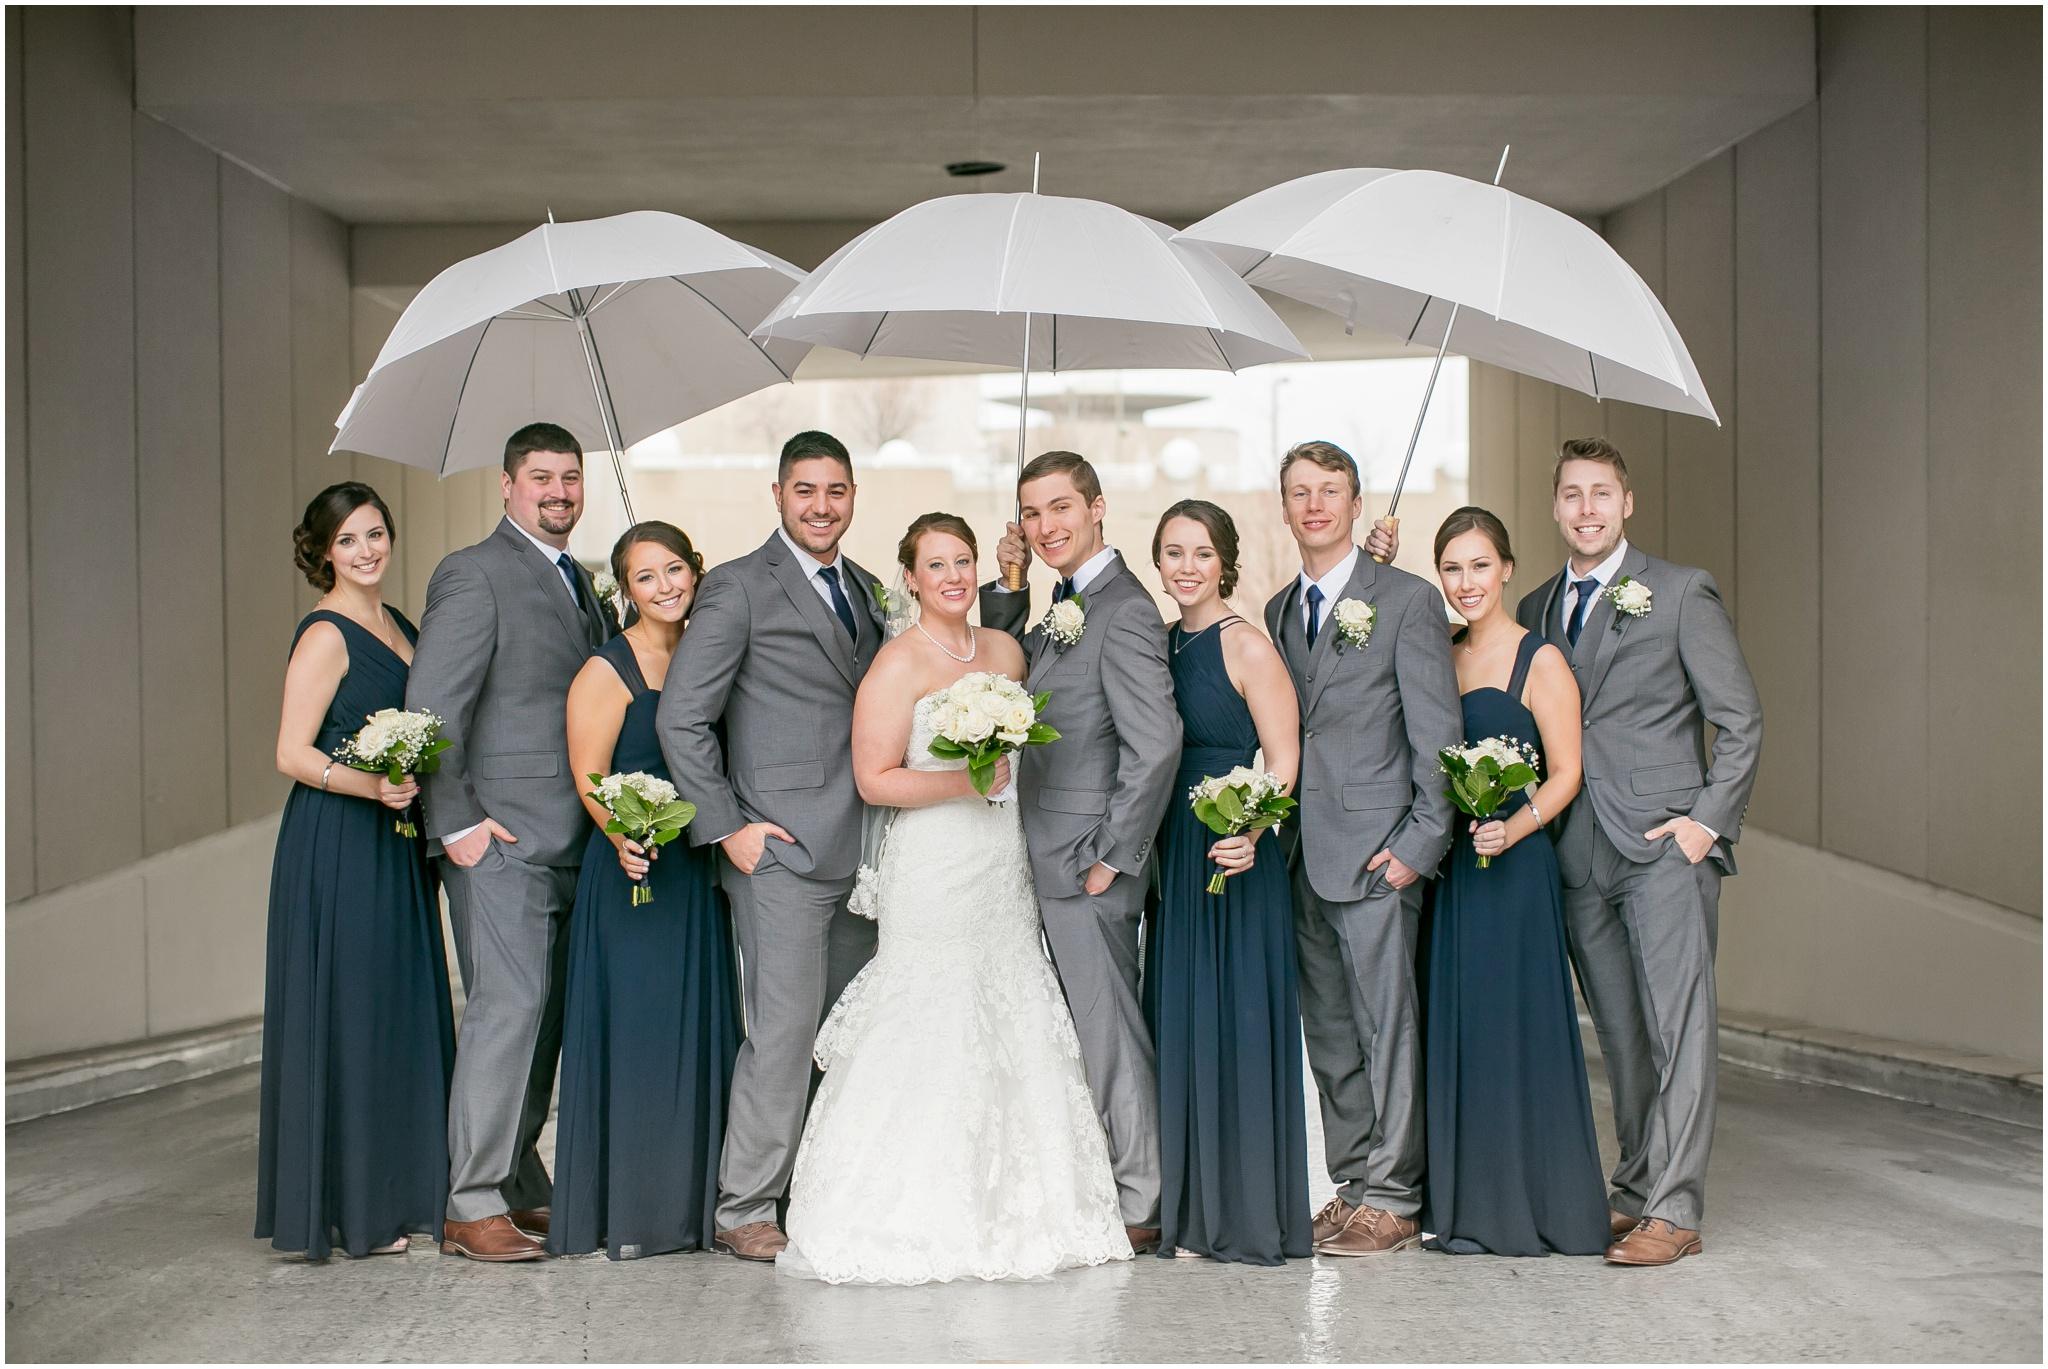 Madison_Club_Madison_Wisconsin_Wedding_Photographer_Spring_Rainy_Wedding_2603.jpg